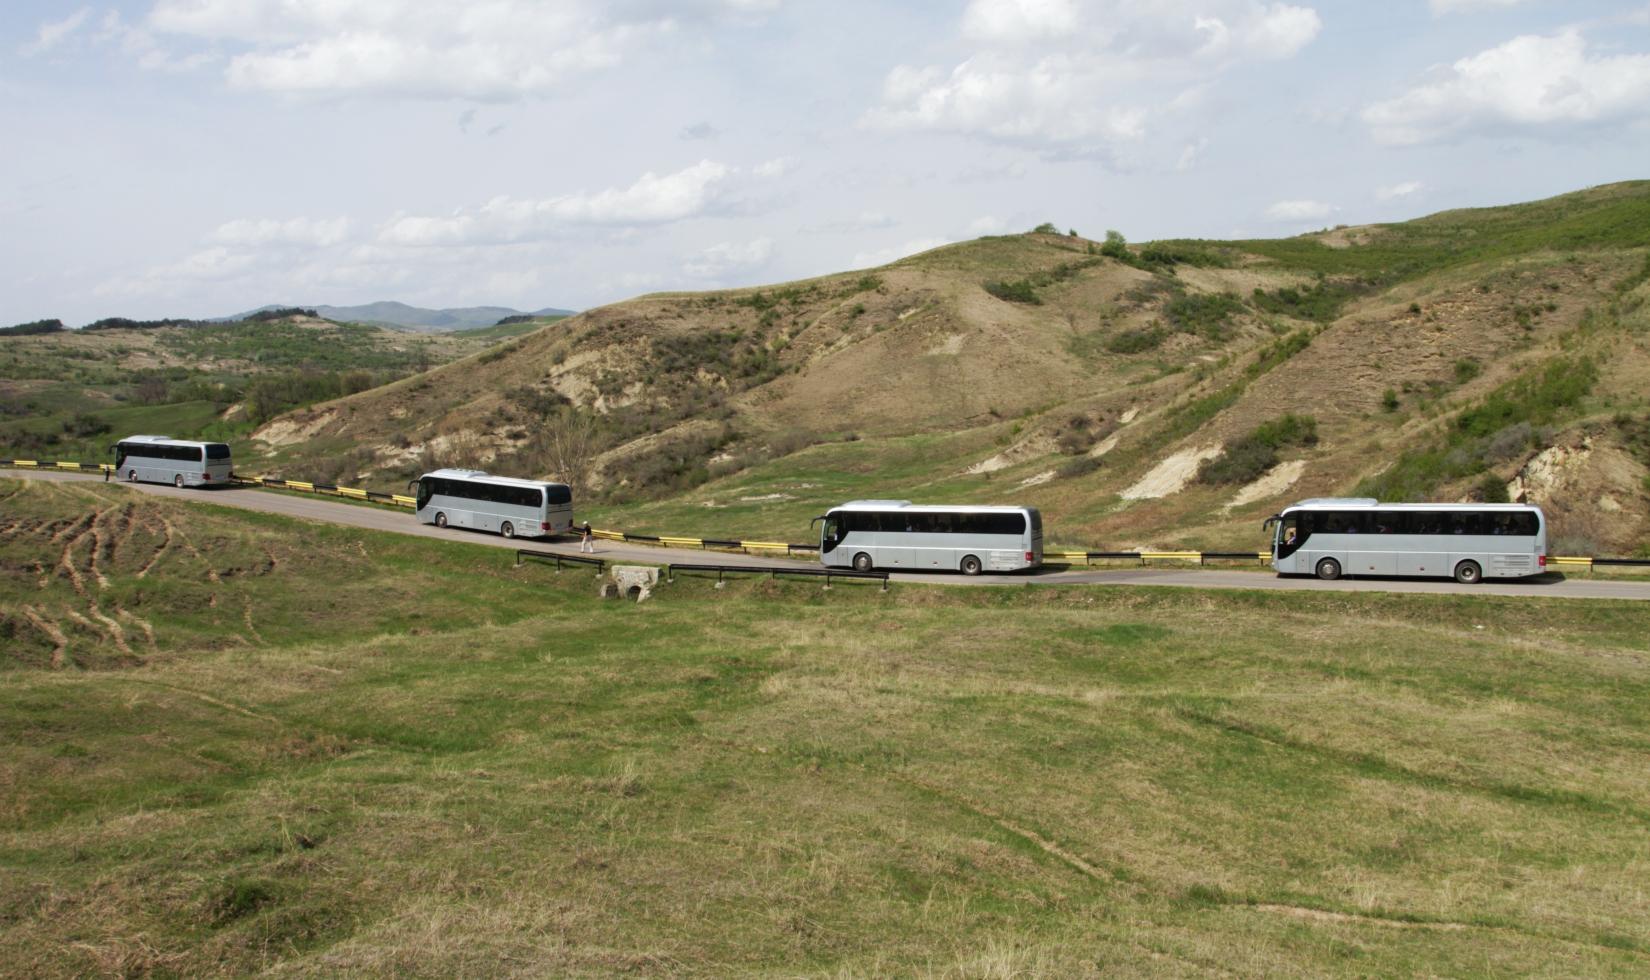 Pelerinaje in Romania